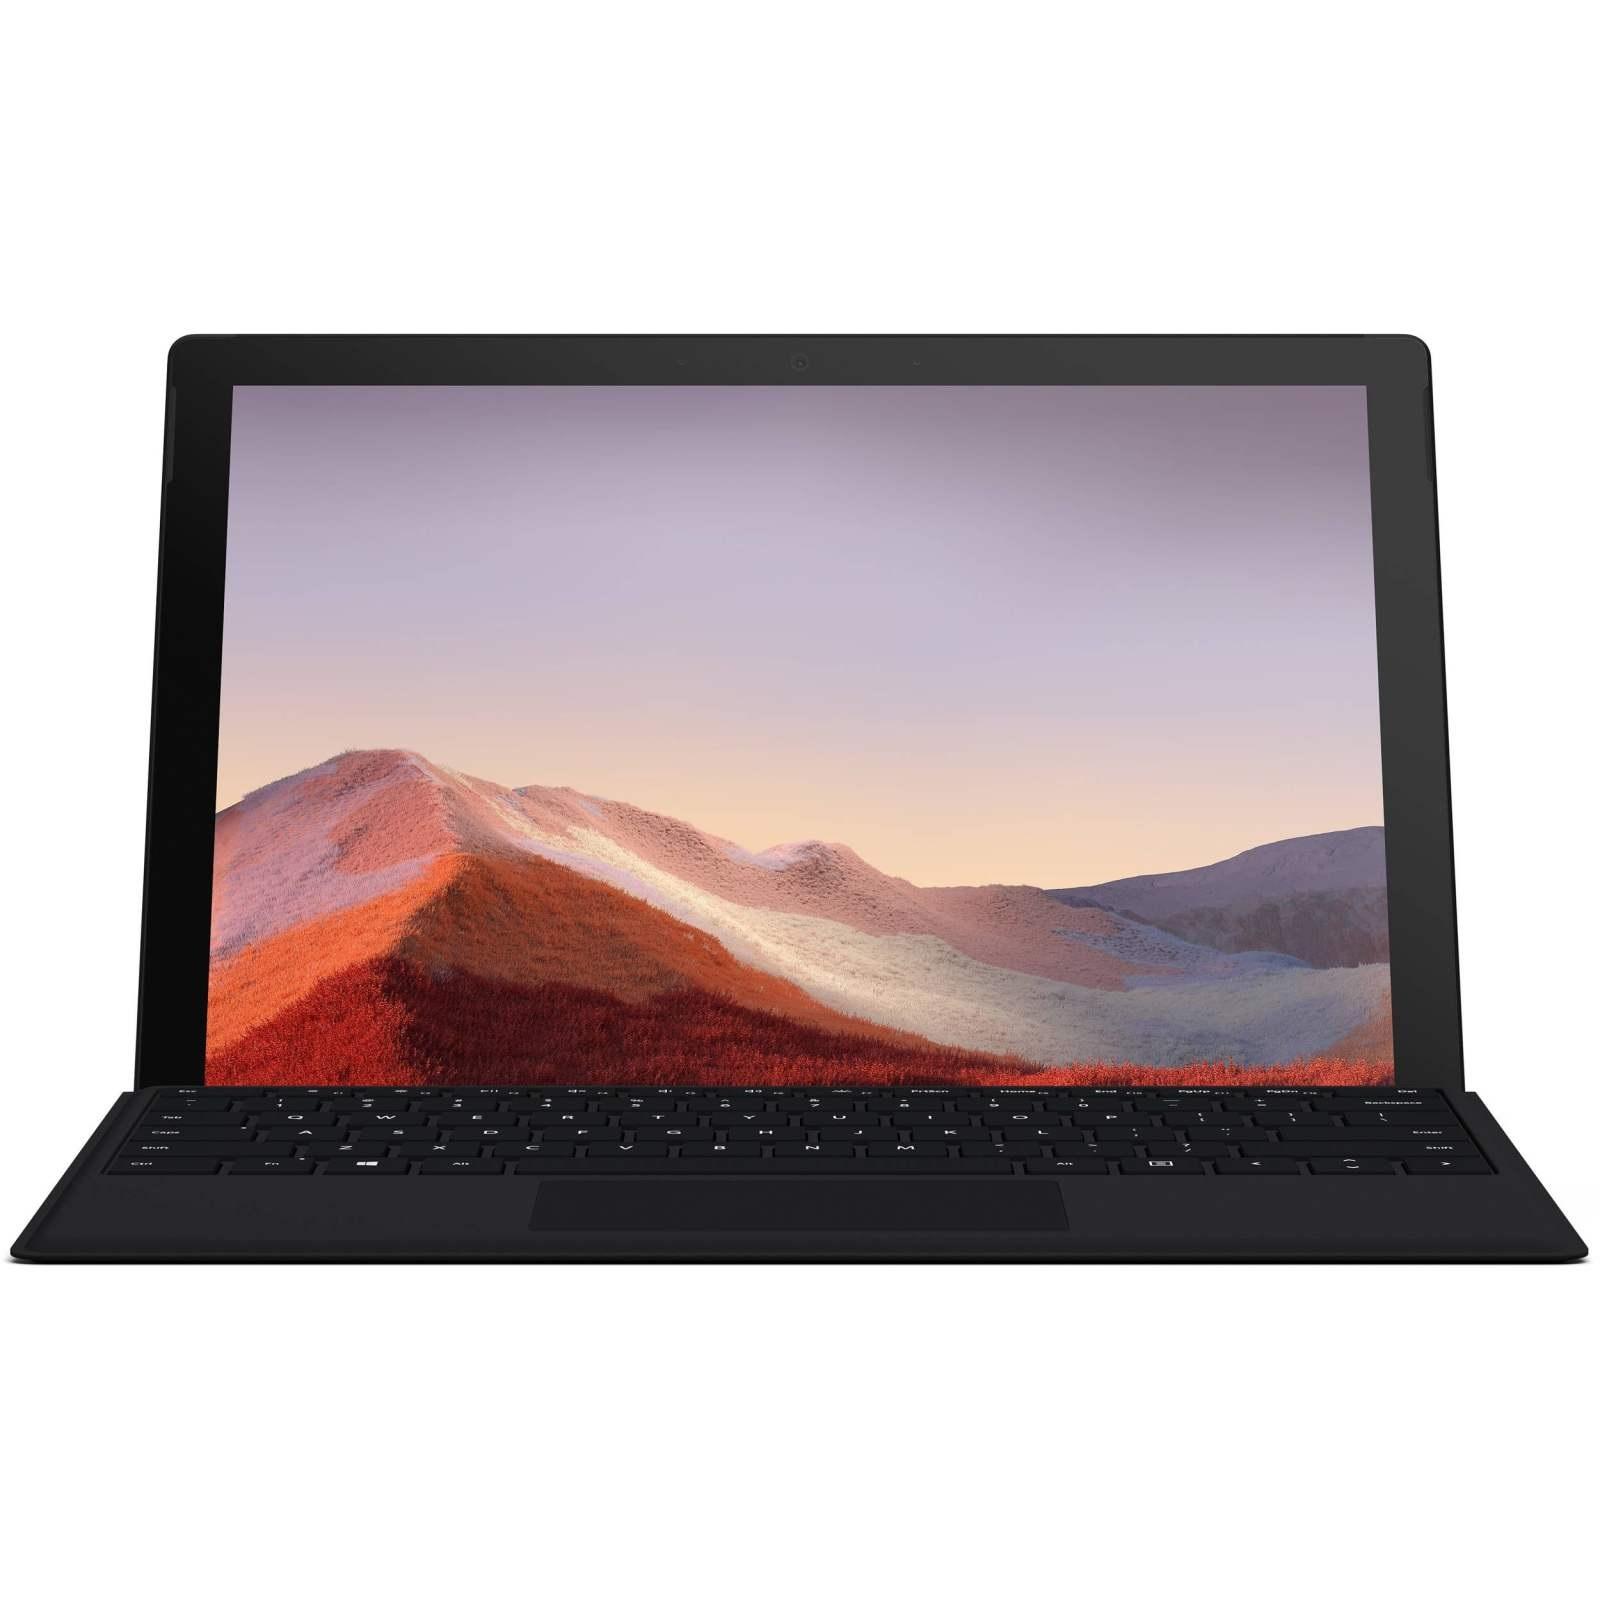 تبلت مایکروسافت مدل Microsoft Surface Pro 7 - C  به همراه کیبورد Signature